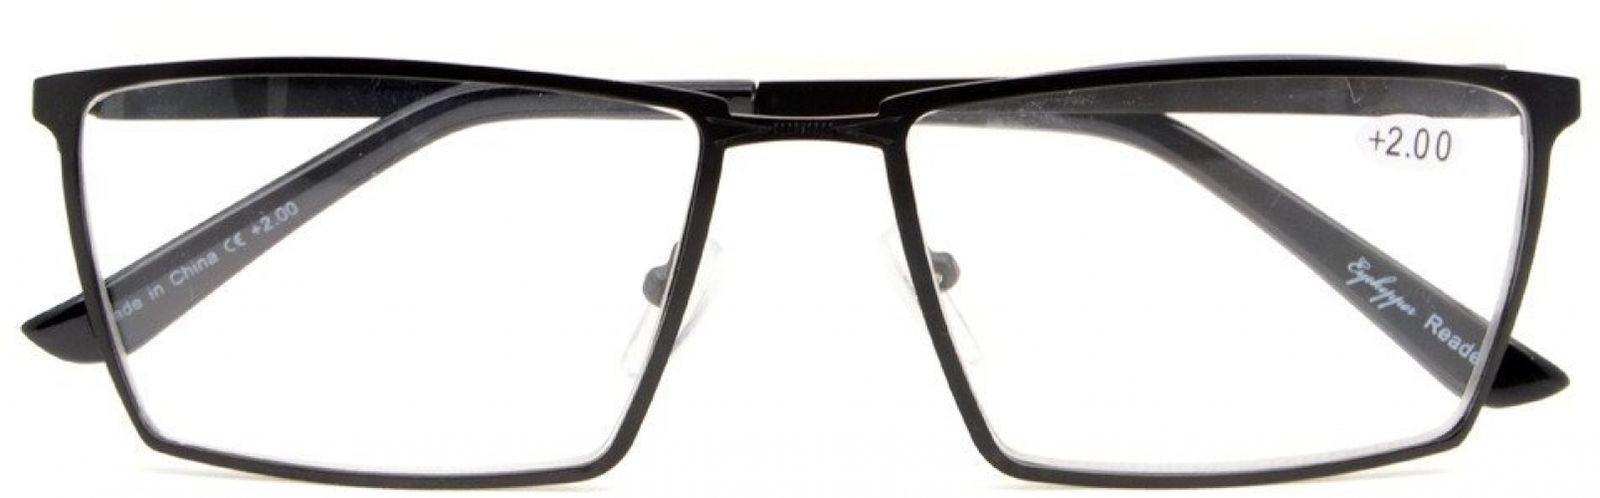 Eyekepper 4-Pack Mens Reading Glasses Spring Hinges Included Tinted Lens +0.75 image 2